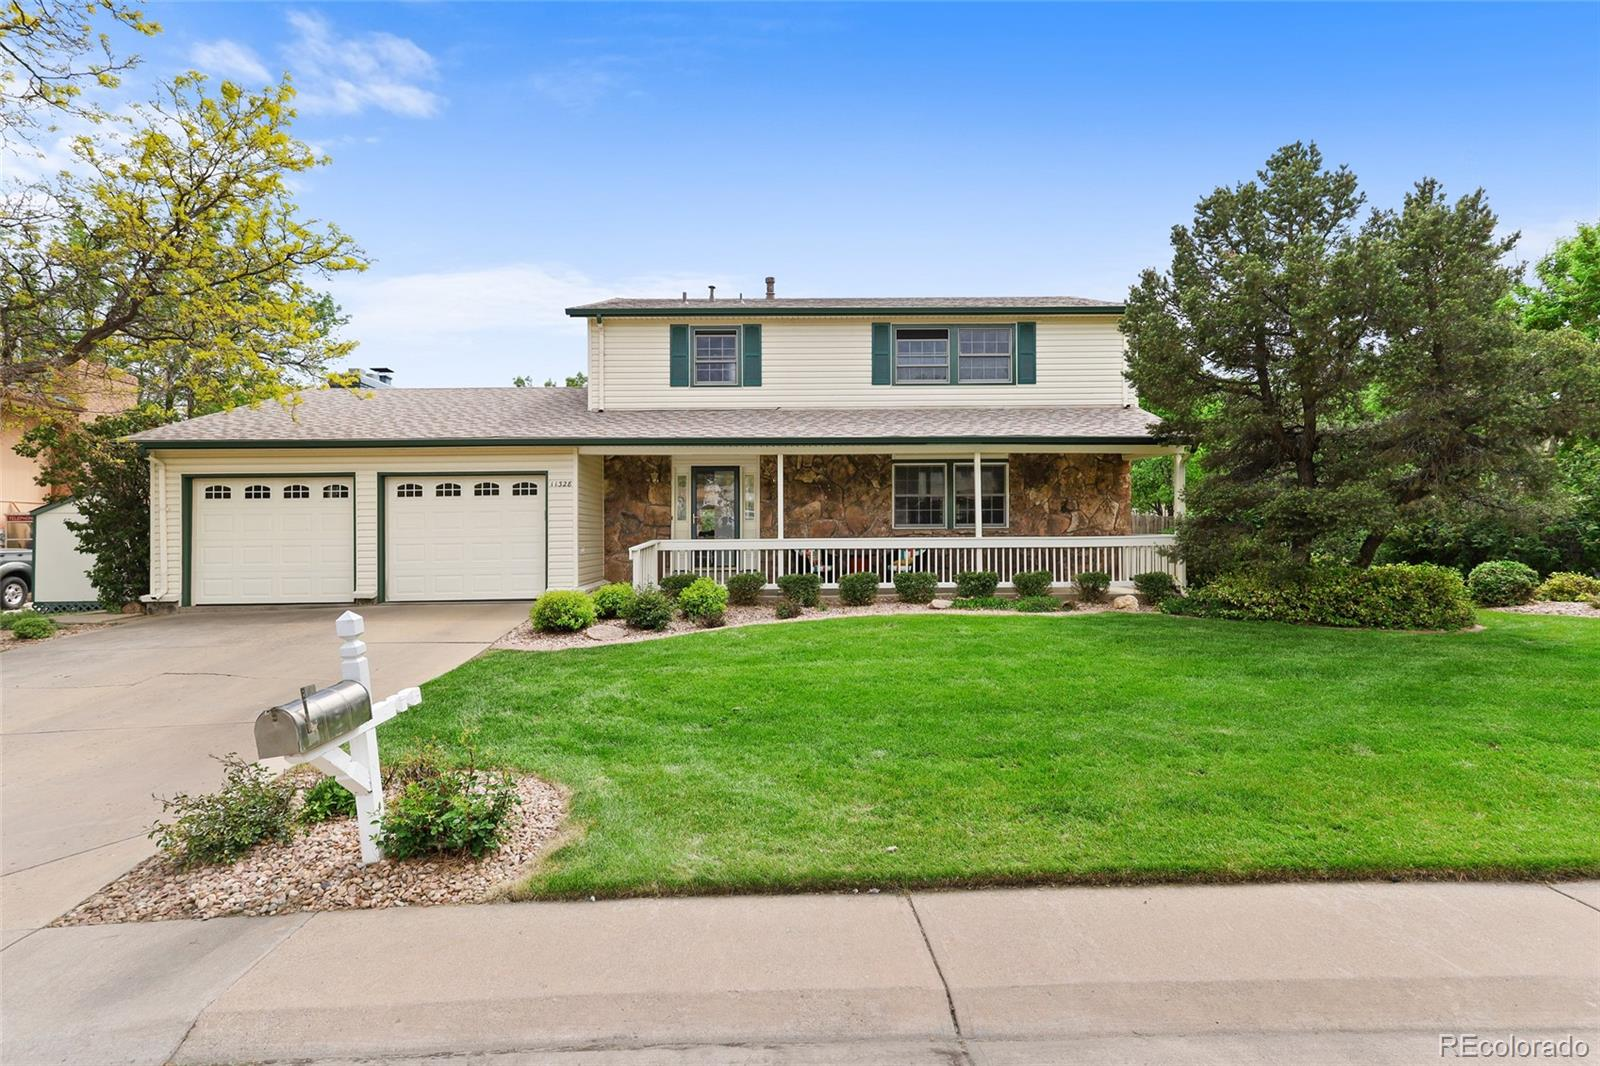 11328 W 70th Avenue Property Photo - Arvada, CO real estate listing